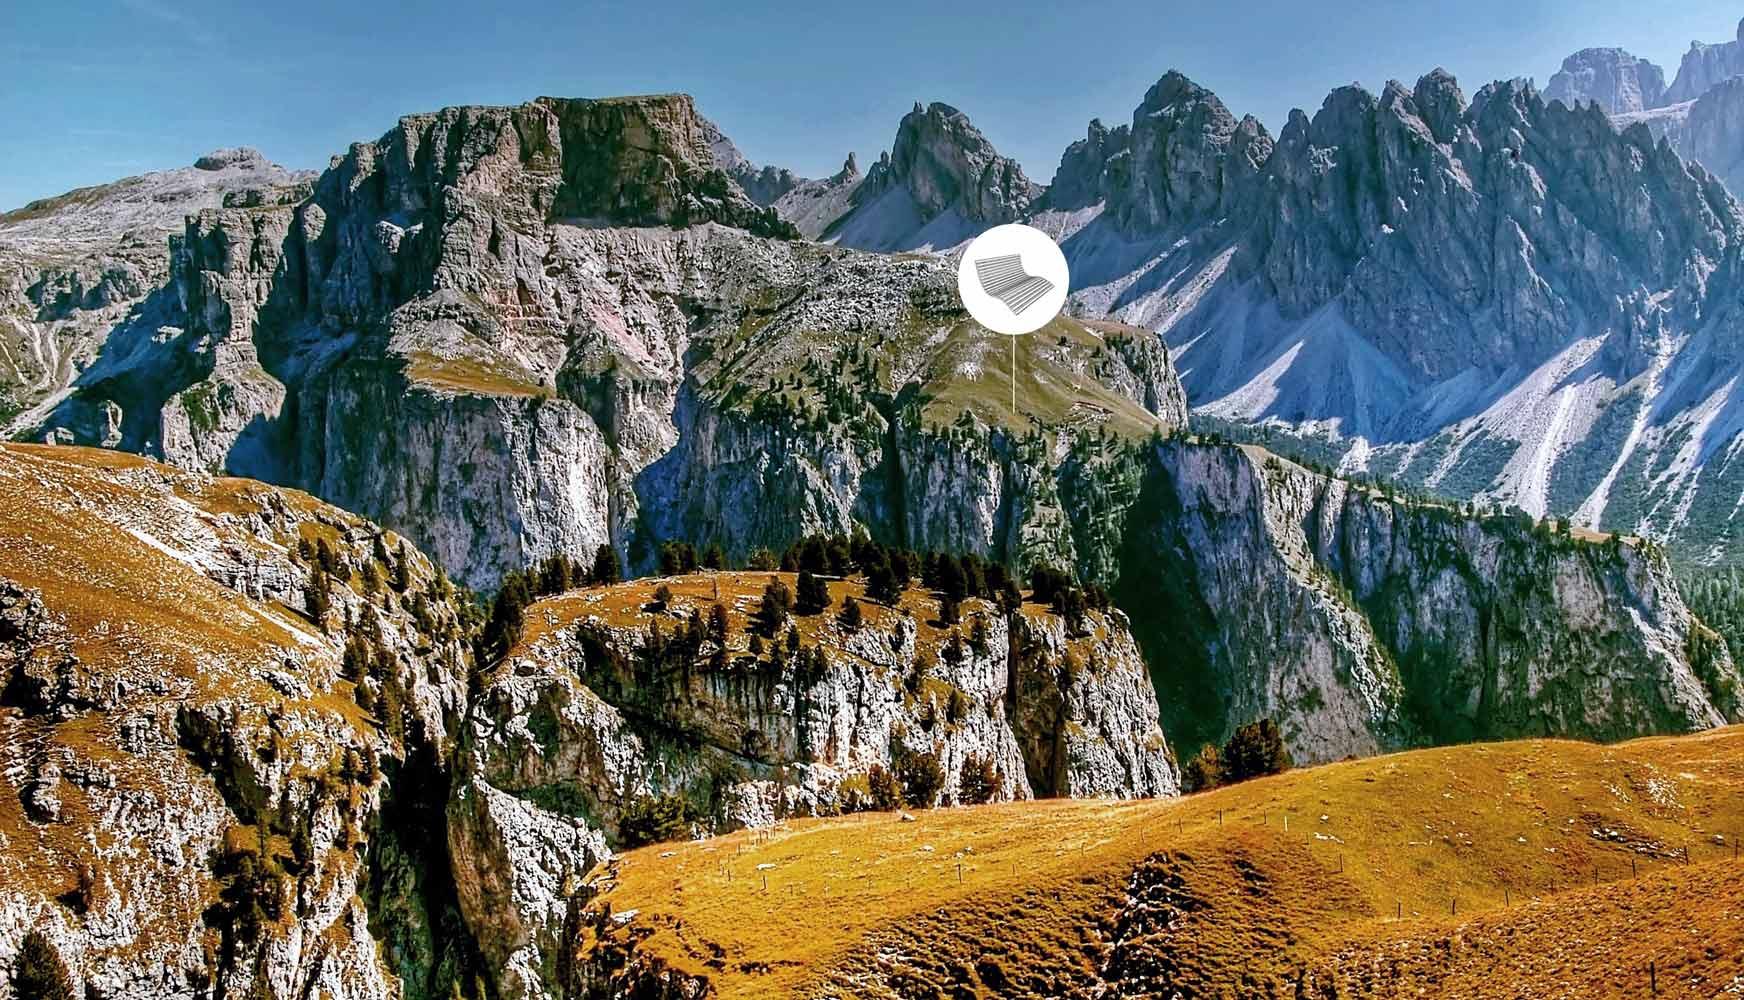 naturschutzgebiet-wanderliegen-schwungliegen-relaxliegen-hangsofa-waldsofa